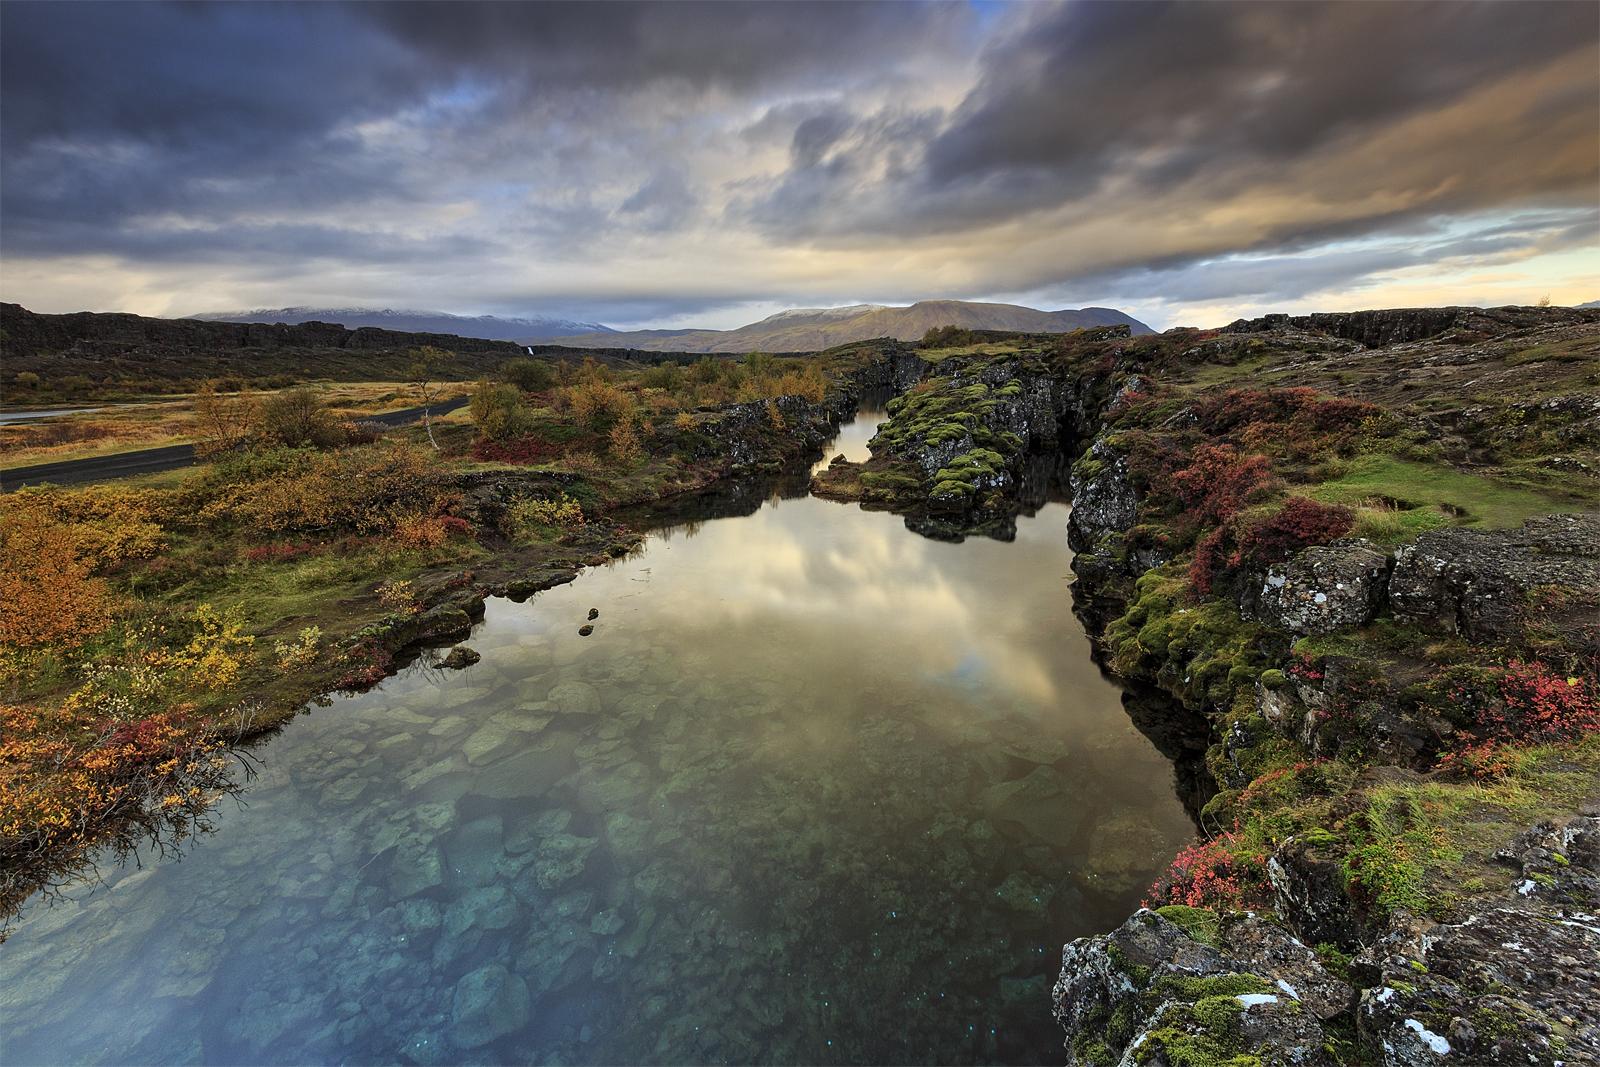 Thingvellir National Park, where two tectonic plates are drifting apart